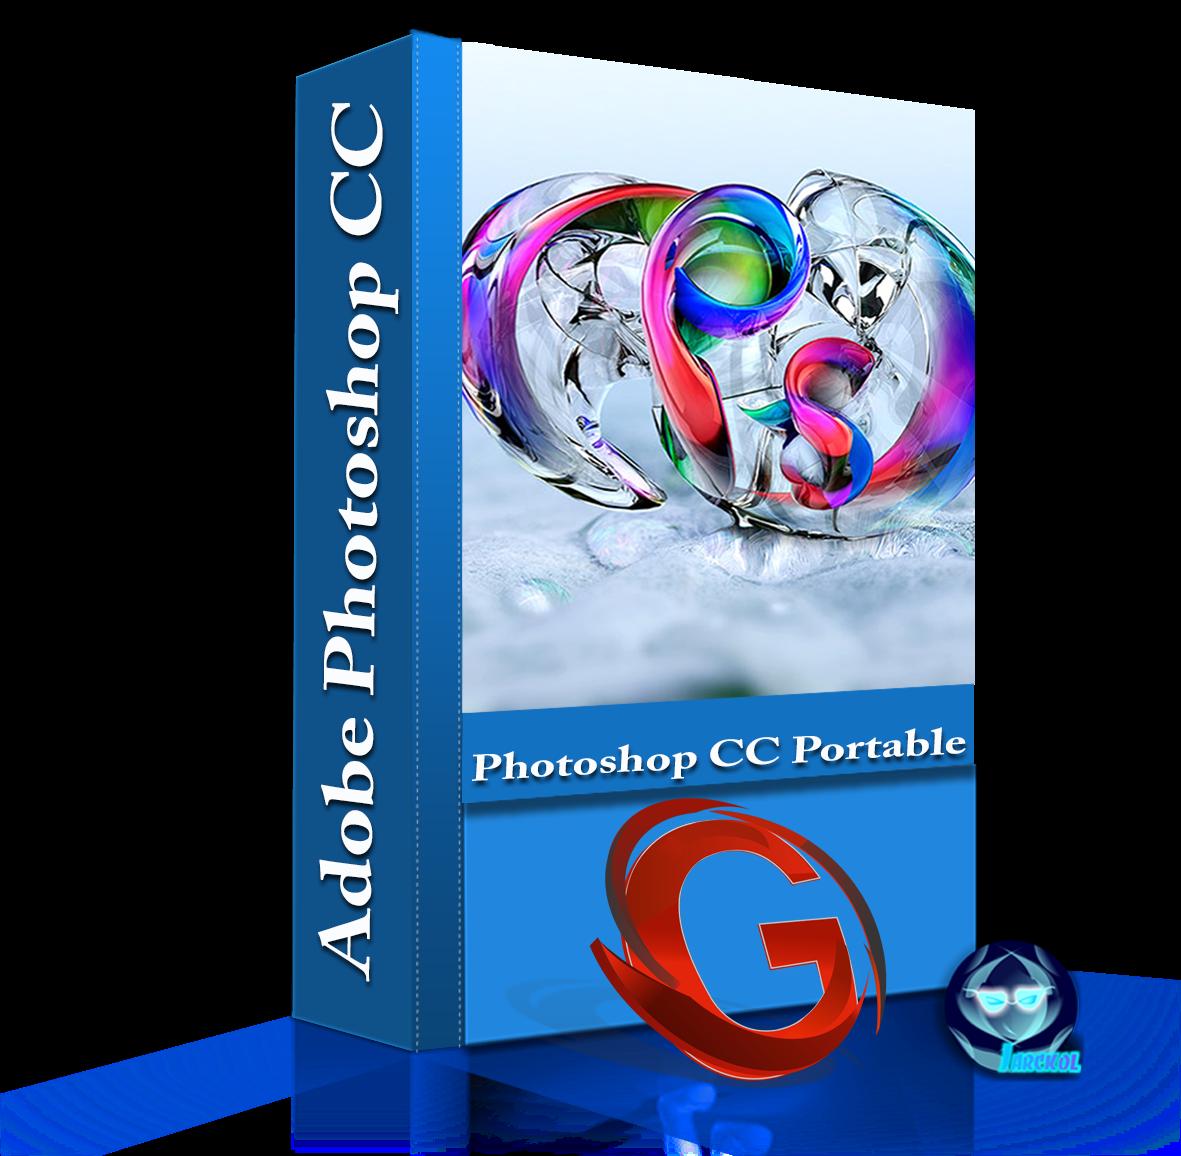 Adobe photoshop cc 64 bit free download